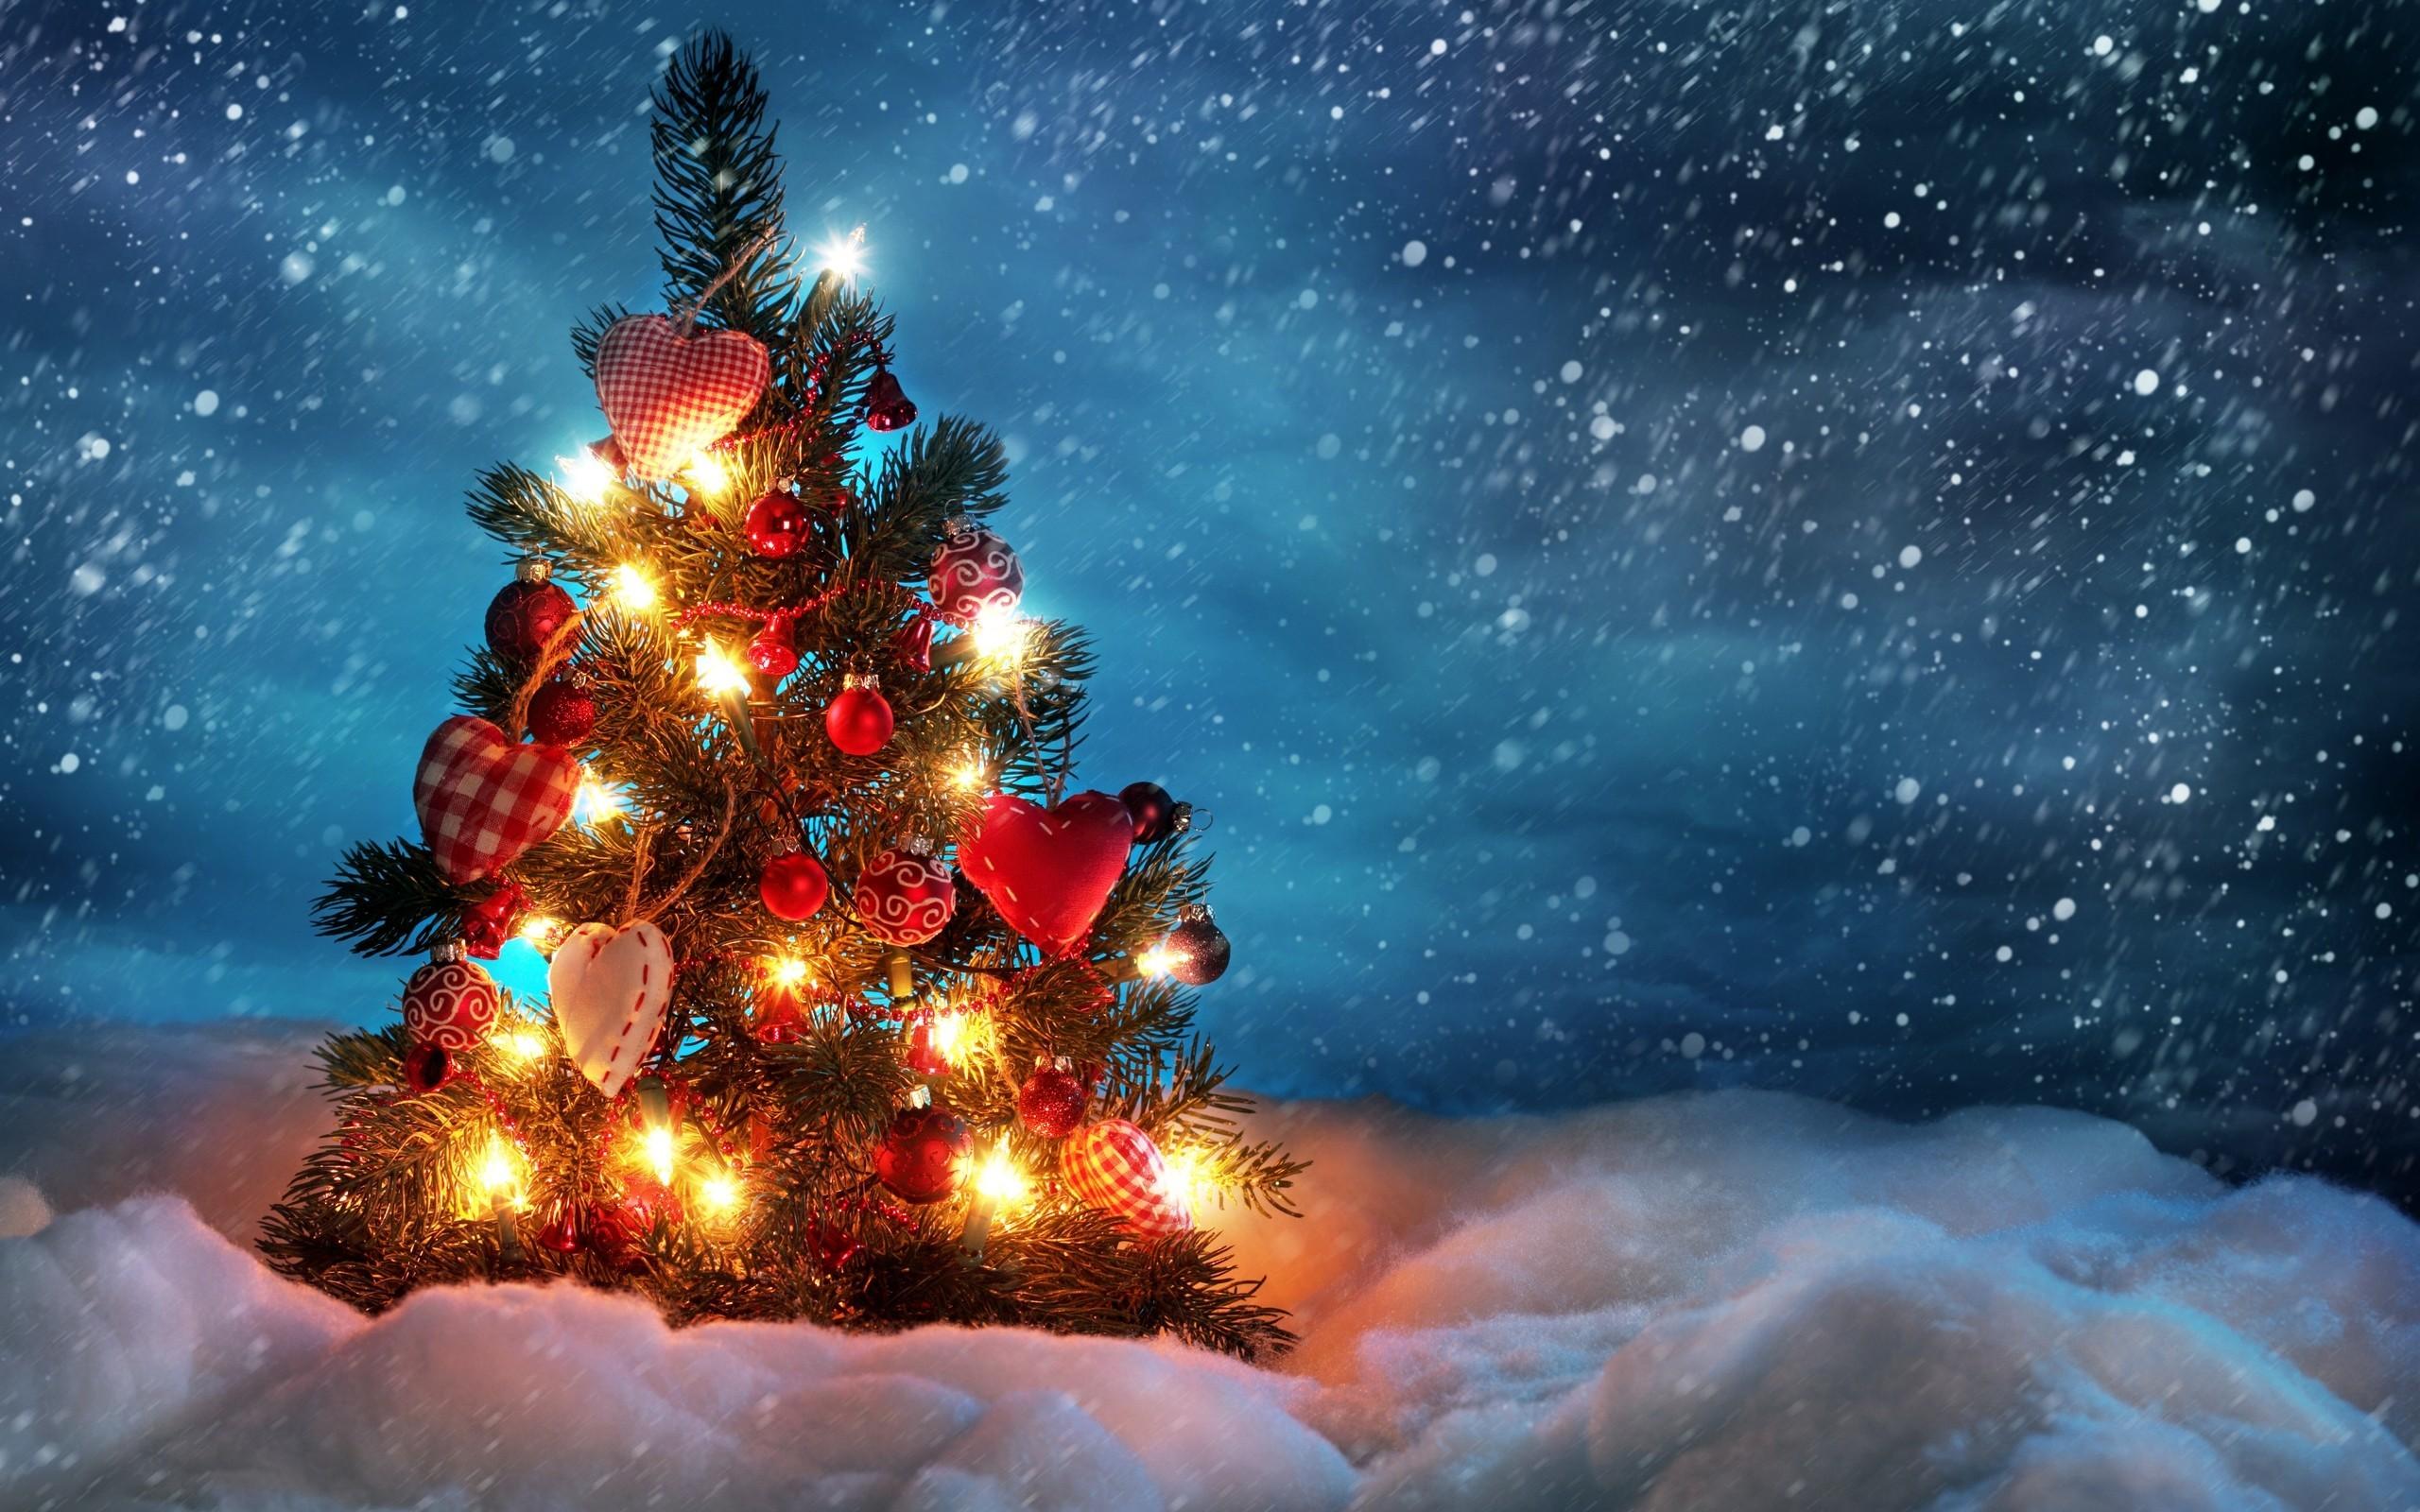 1920x1080 animated christmas desktop backgrounds hd best hd desktop - Animated Christmas Desktop Backgrounds